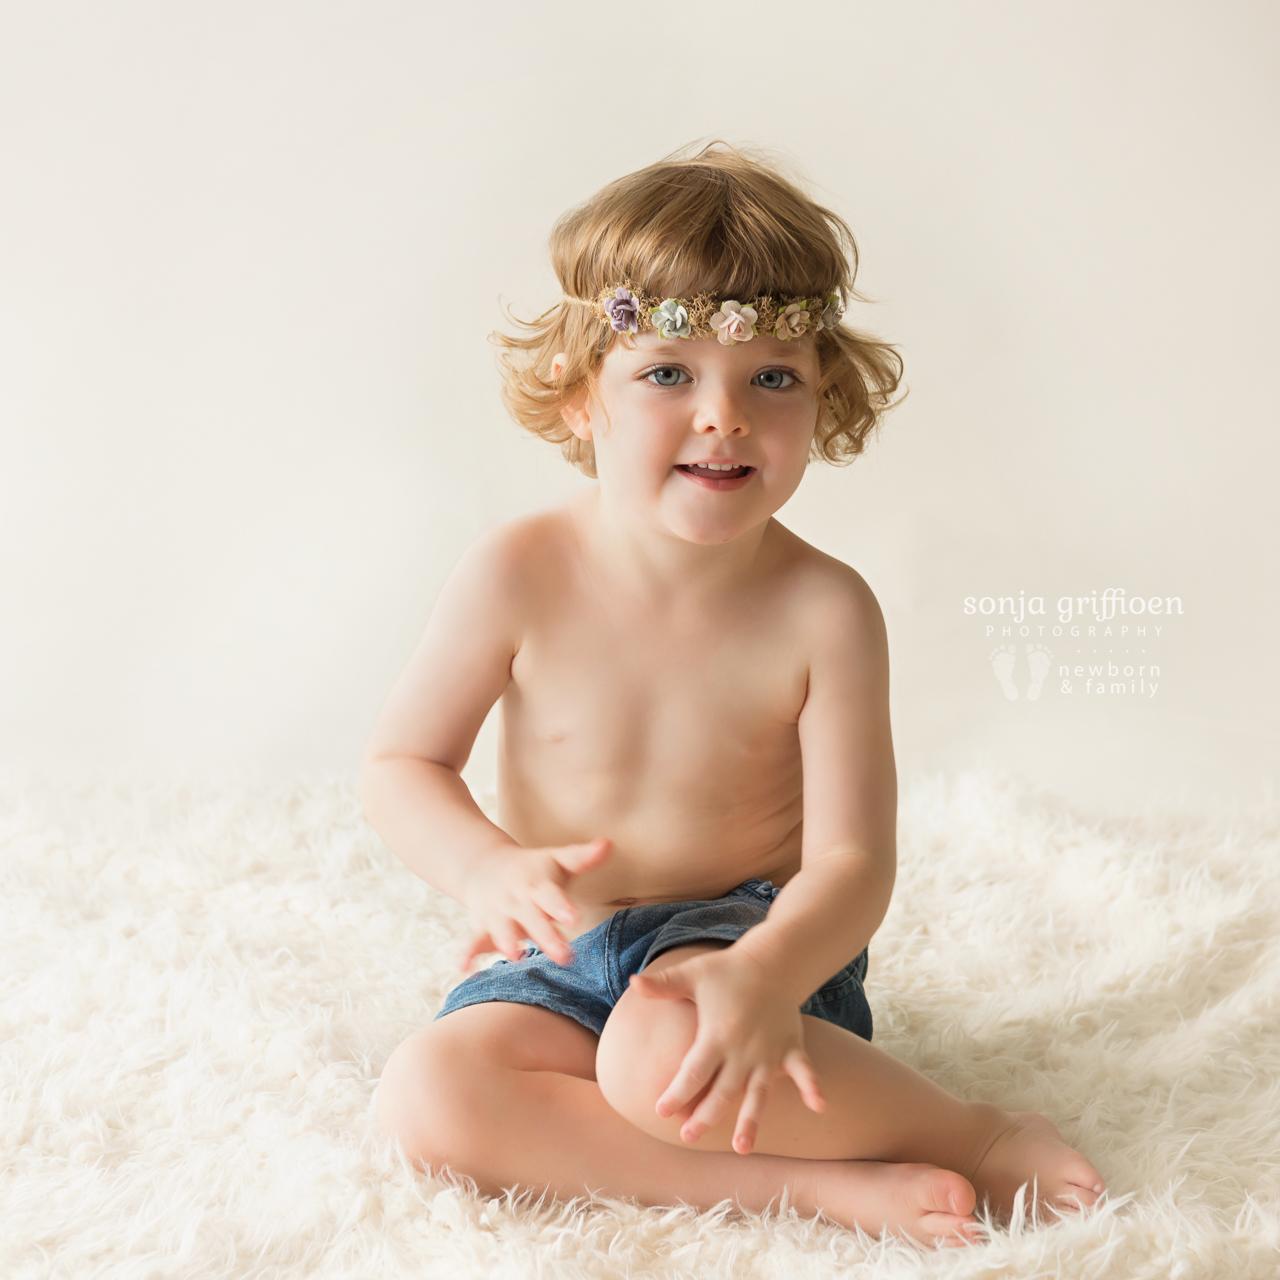 Harry-Newborn-Brisbane-Newborn-Photographer-Sonja-Griffioen-35.jpg